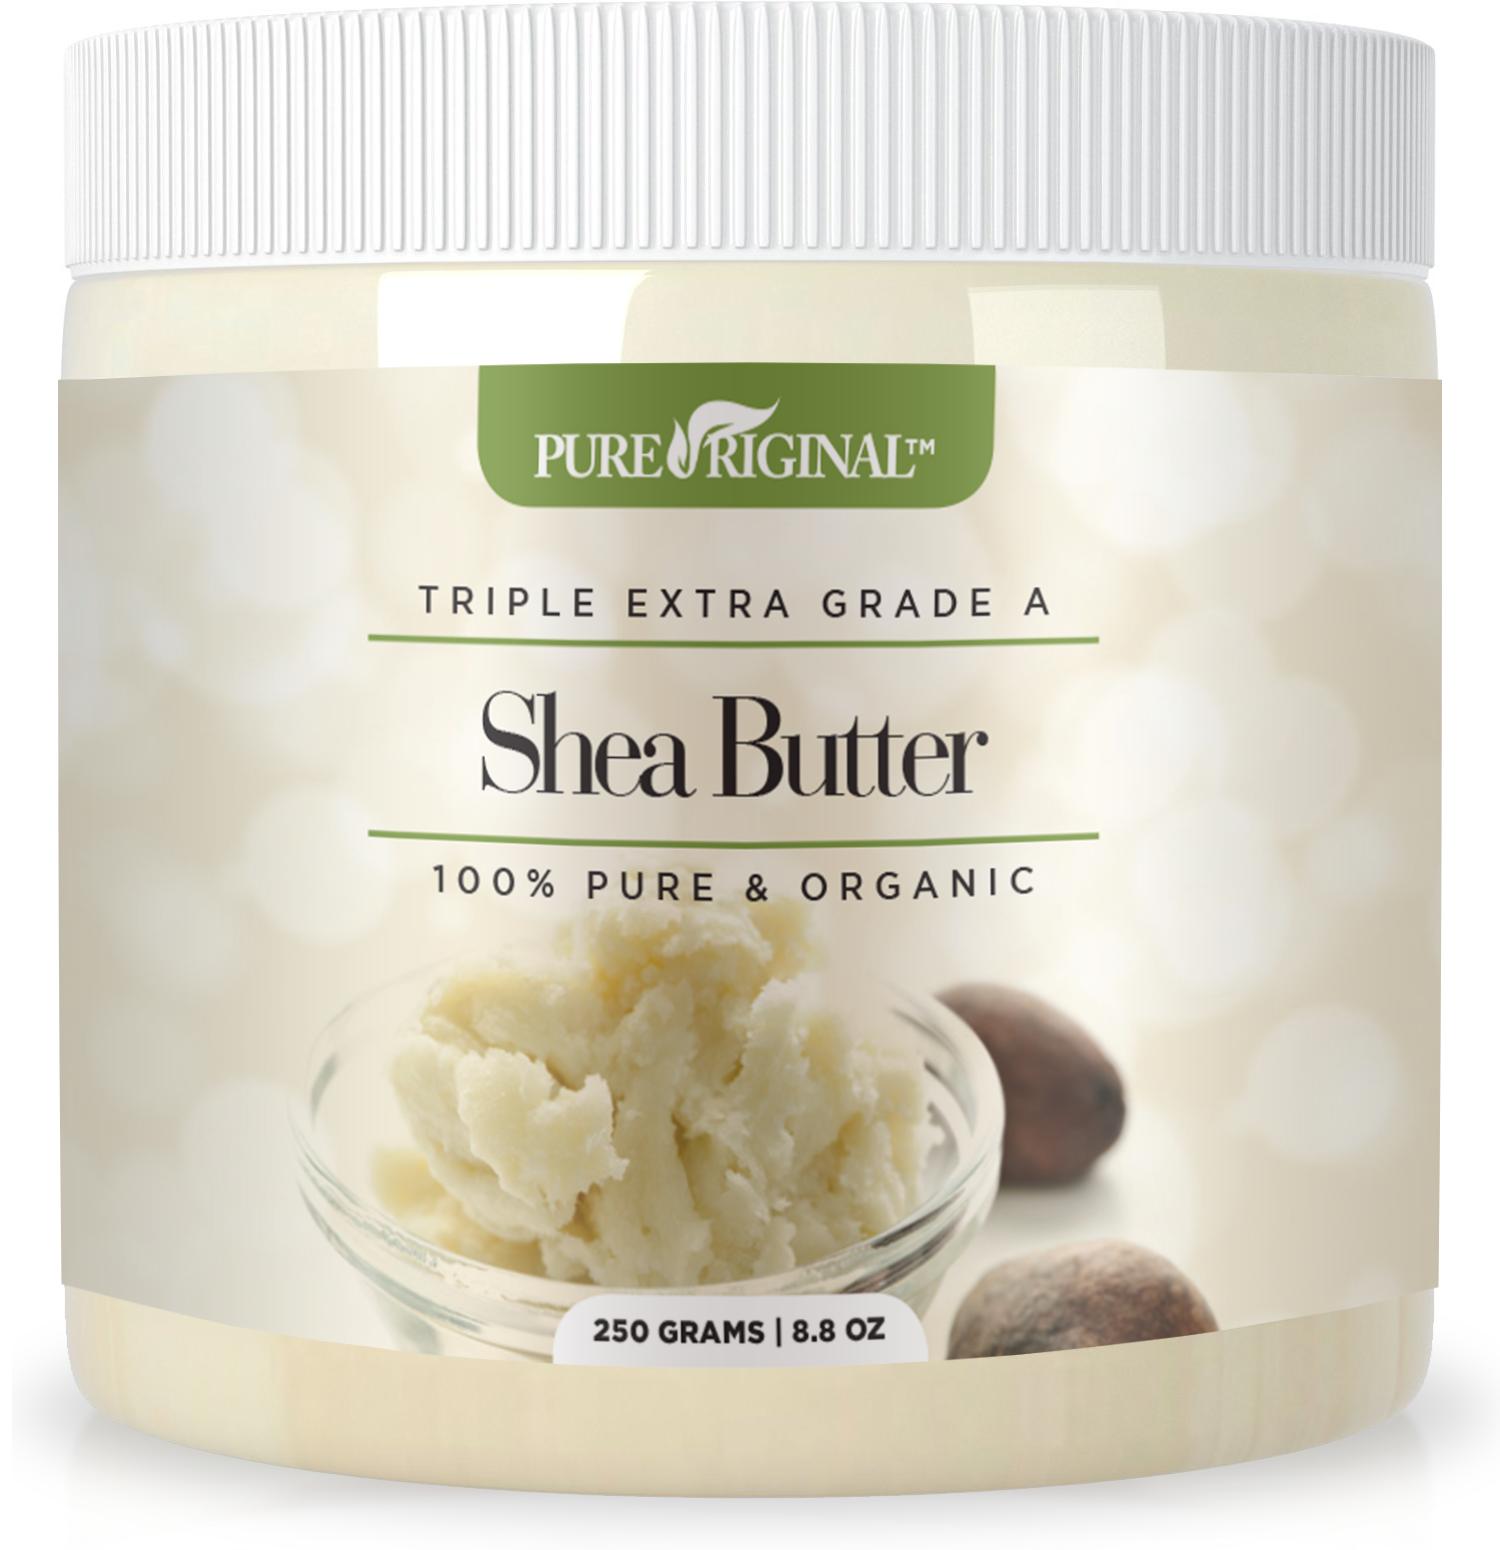 Shea Butter Jar